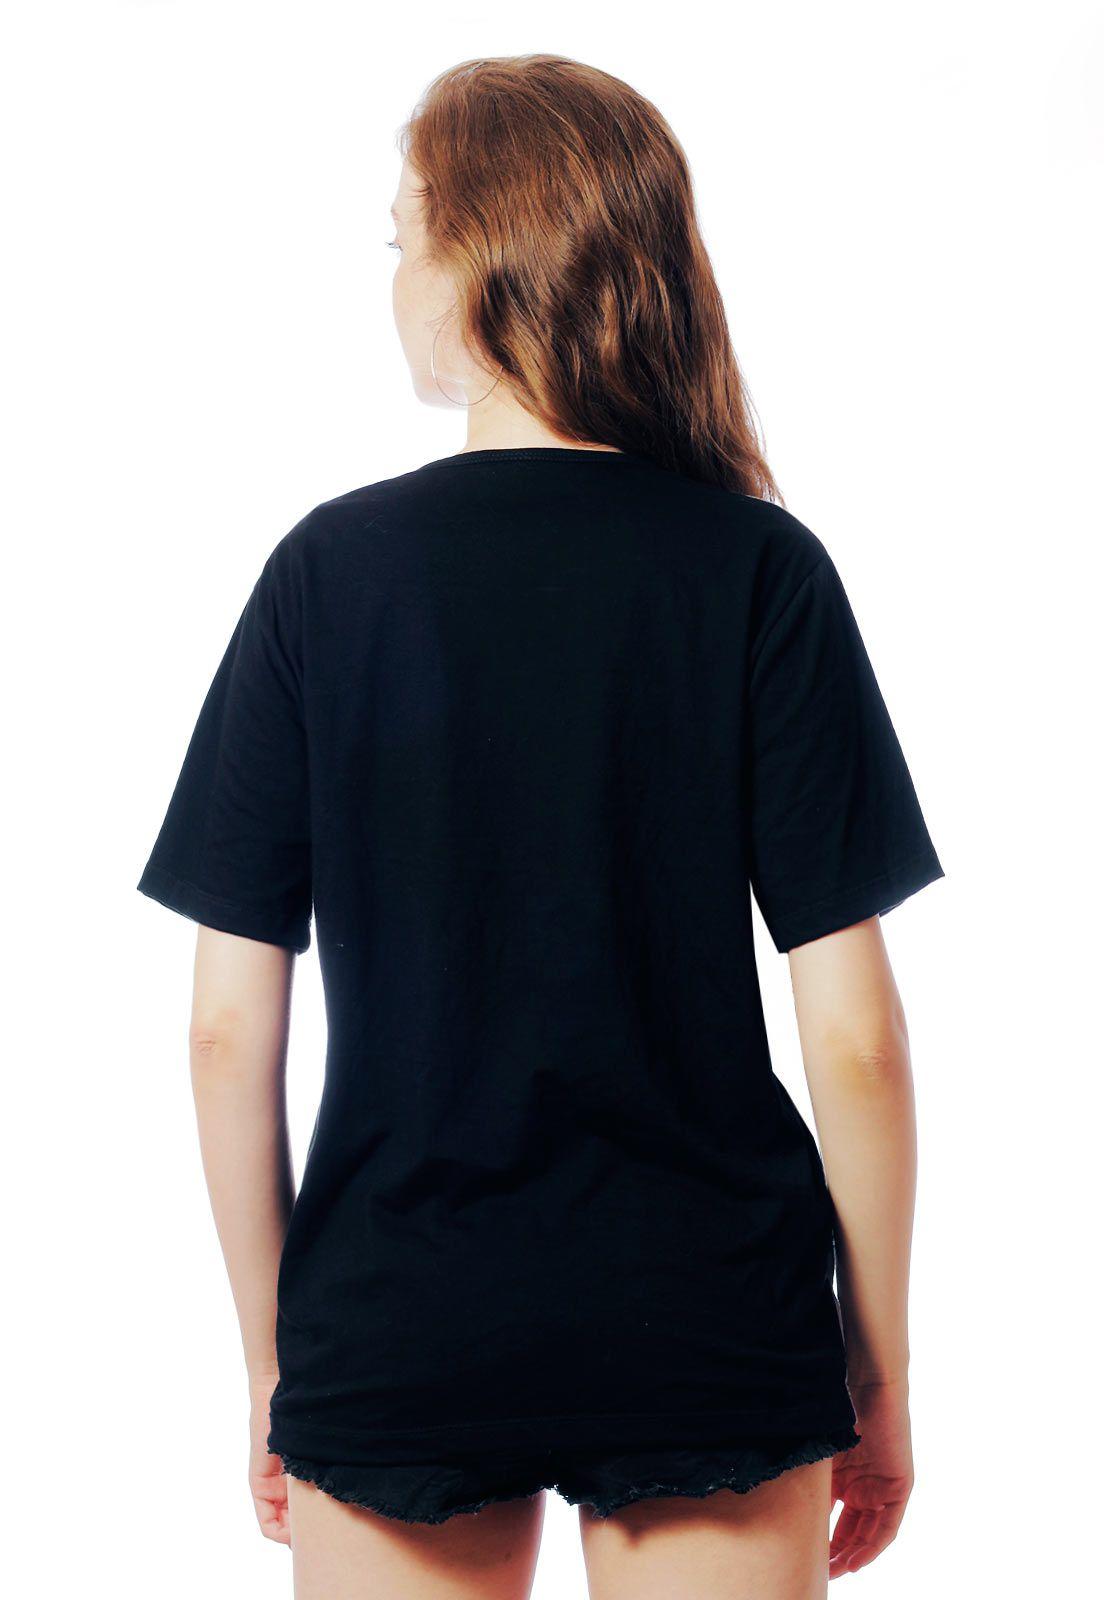 Camiseta ElephunK Estampada Animal Print Neon Preta